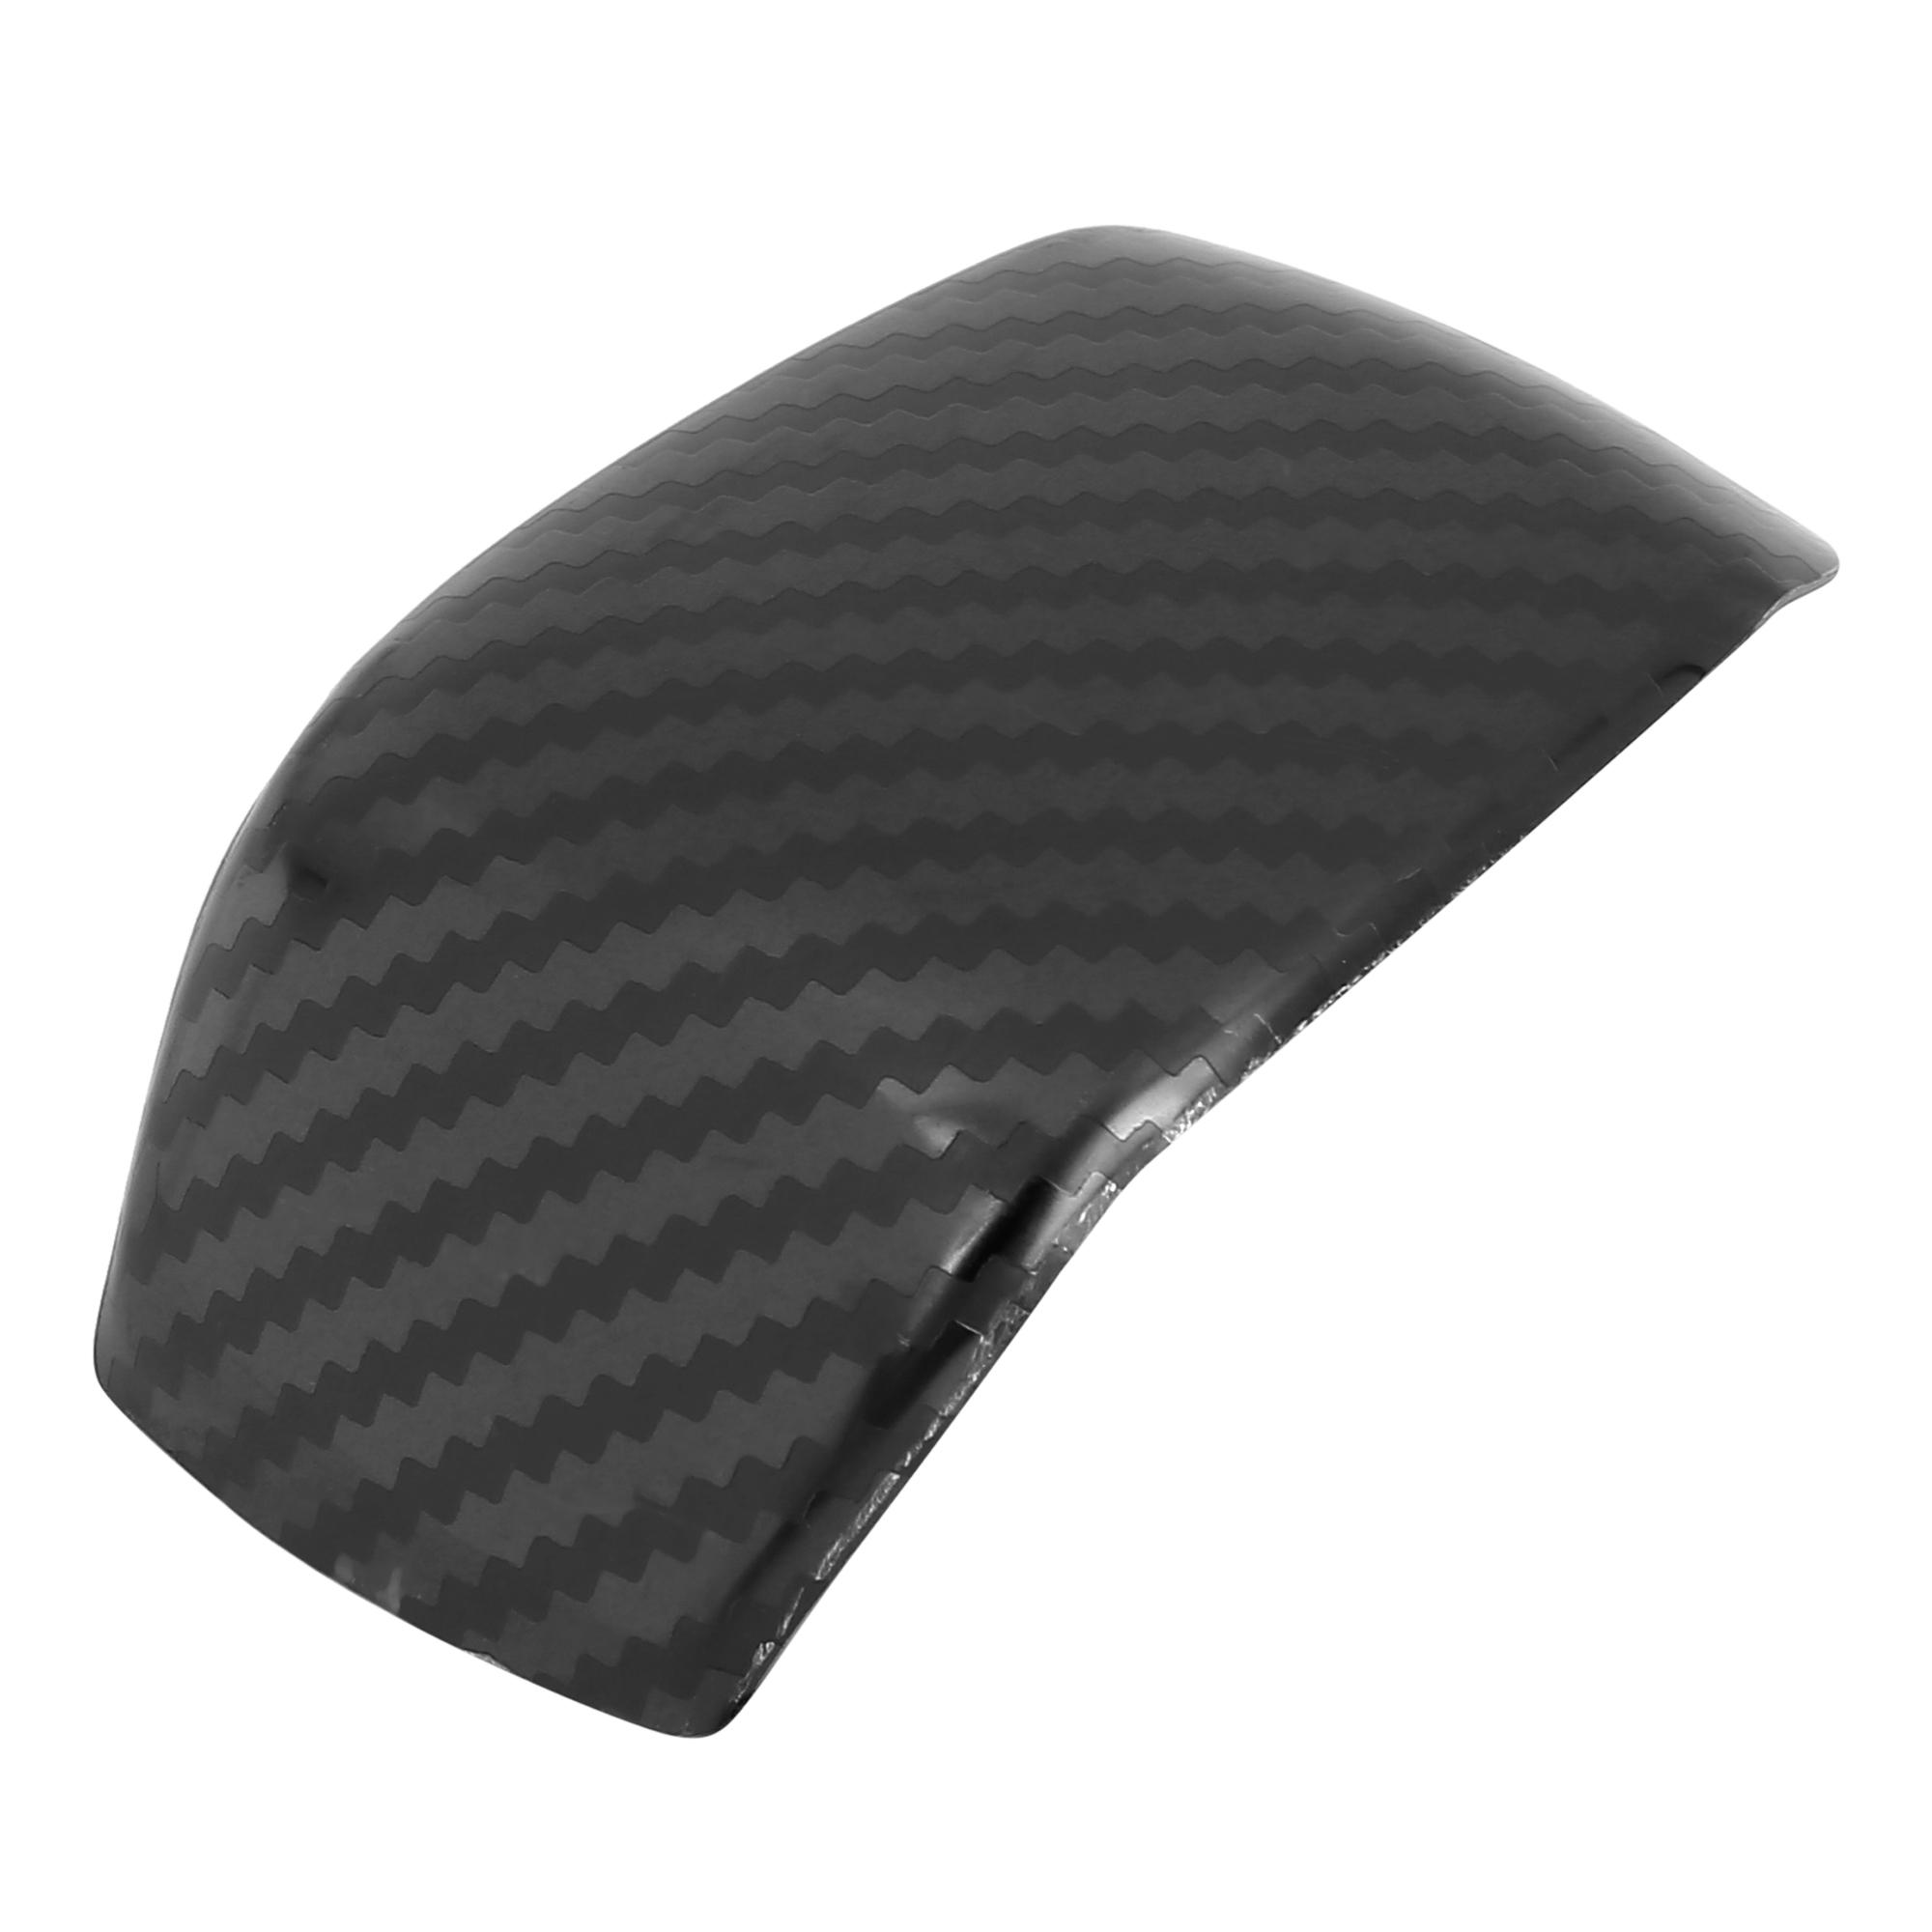 Car Gear Shift Knob Panel Cover Carbon Fiber Pattern for Toyota RAV4 2019-2020